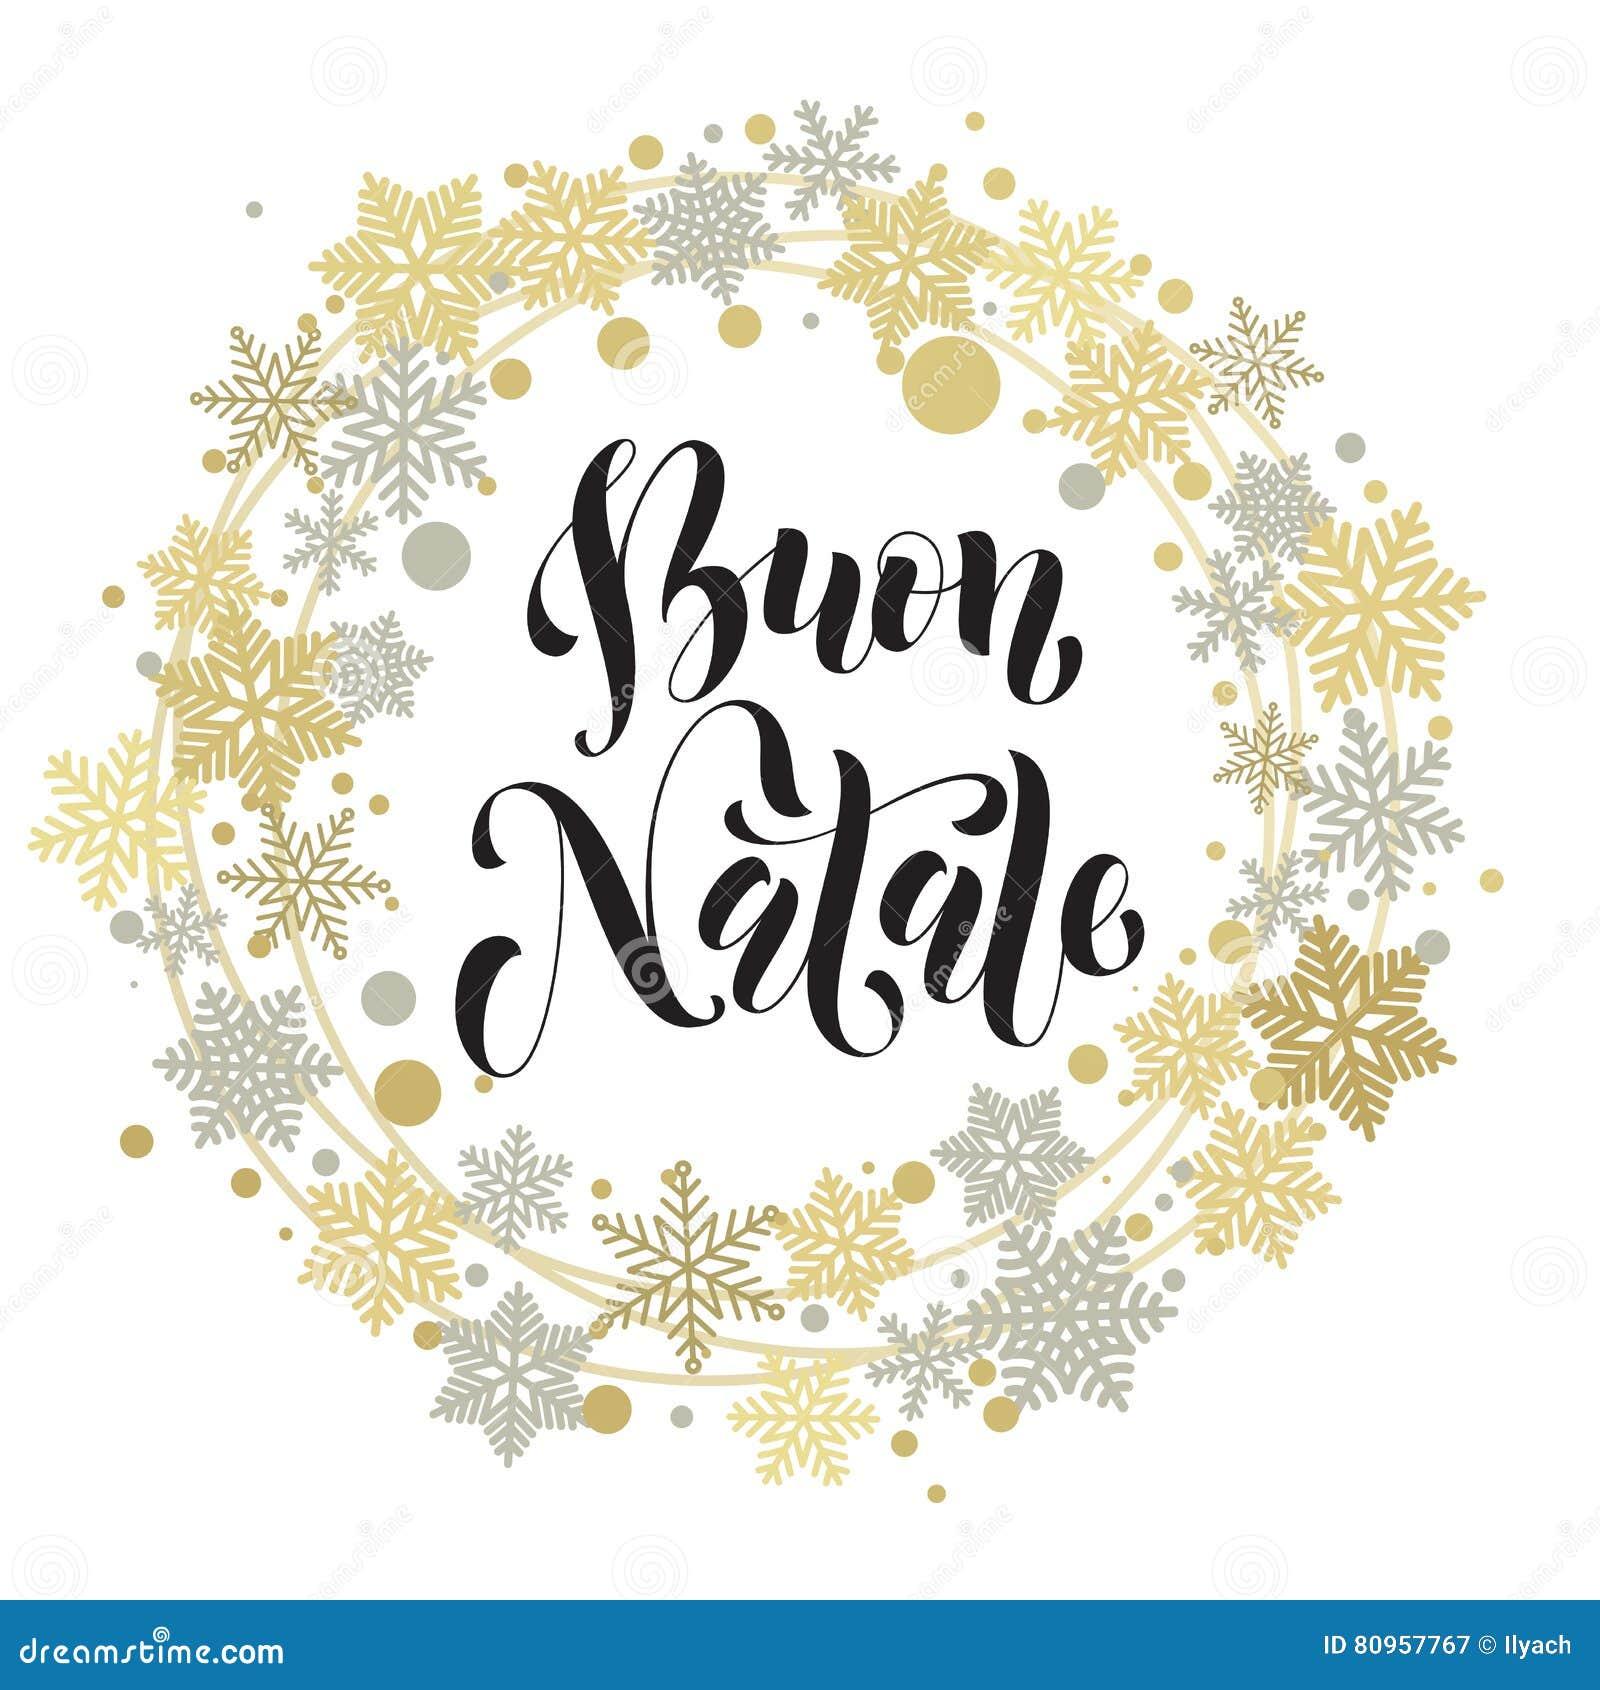 Buon Natale Ornament.Buon Natale Italian Merry Christmas Text Greeting Card Stock